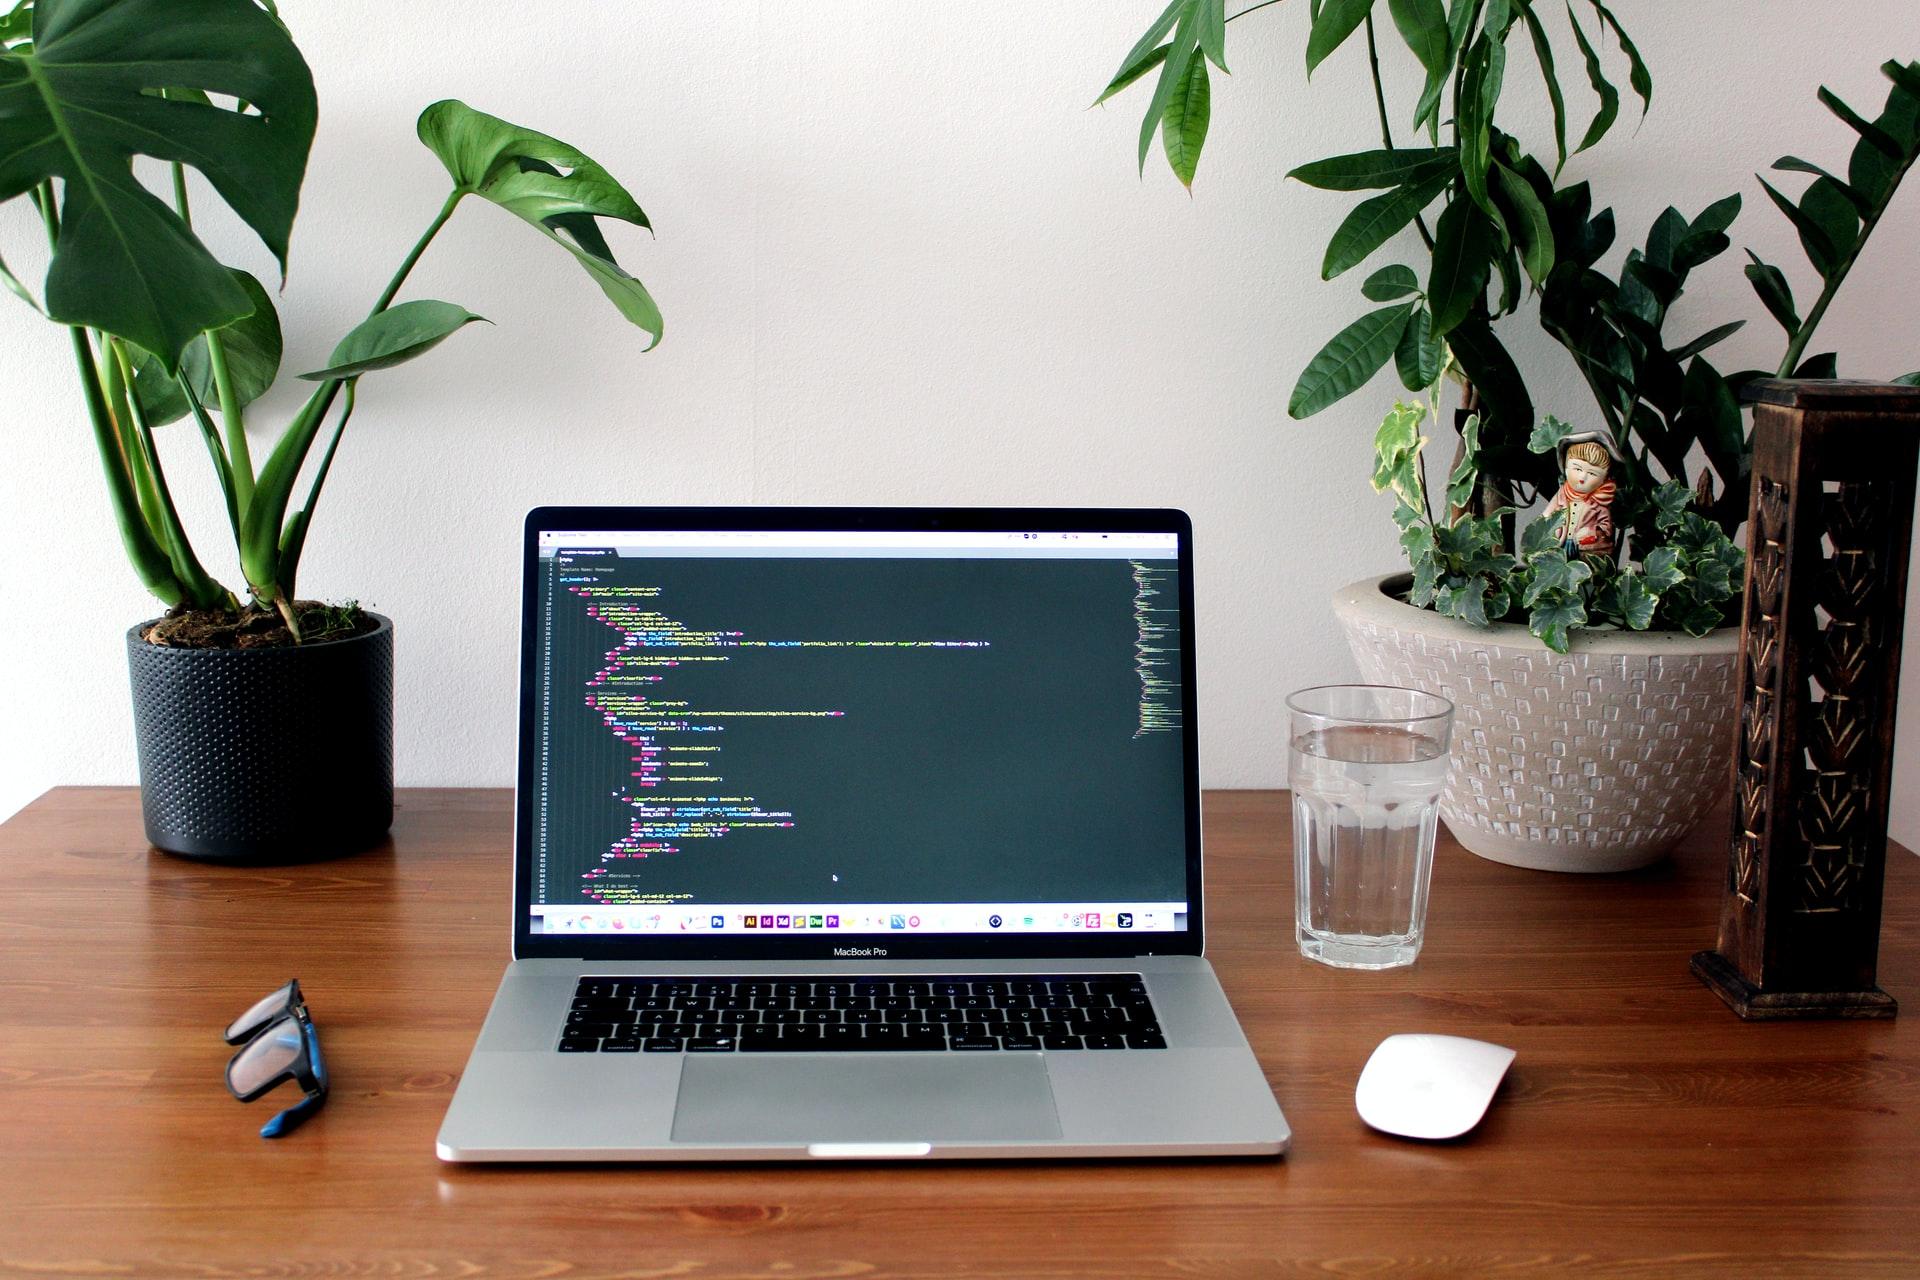 Laptop showing code editor on desk